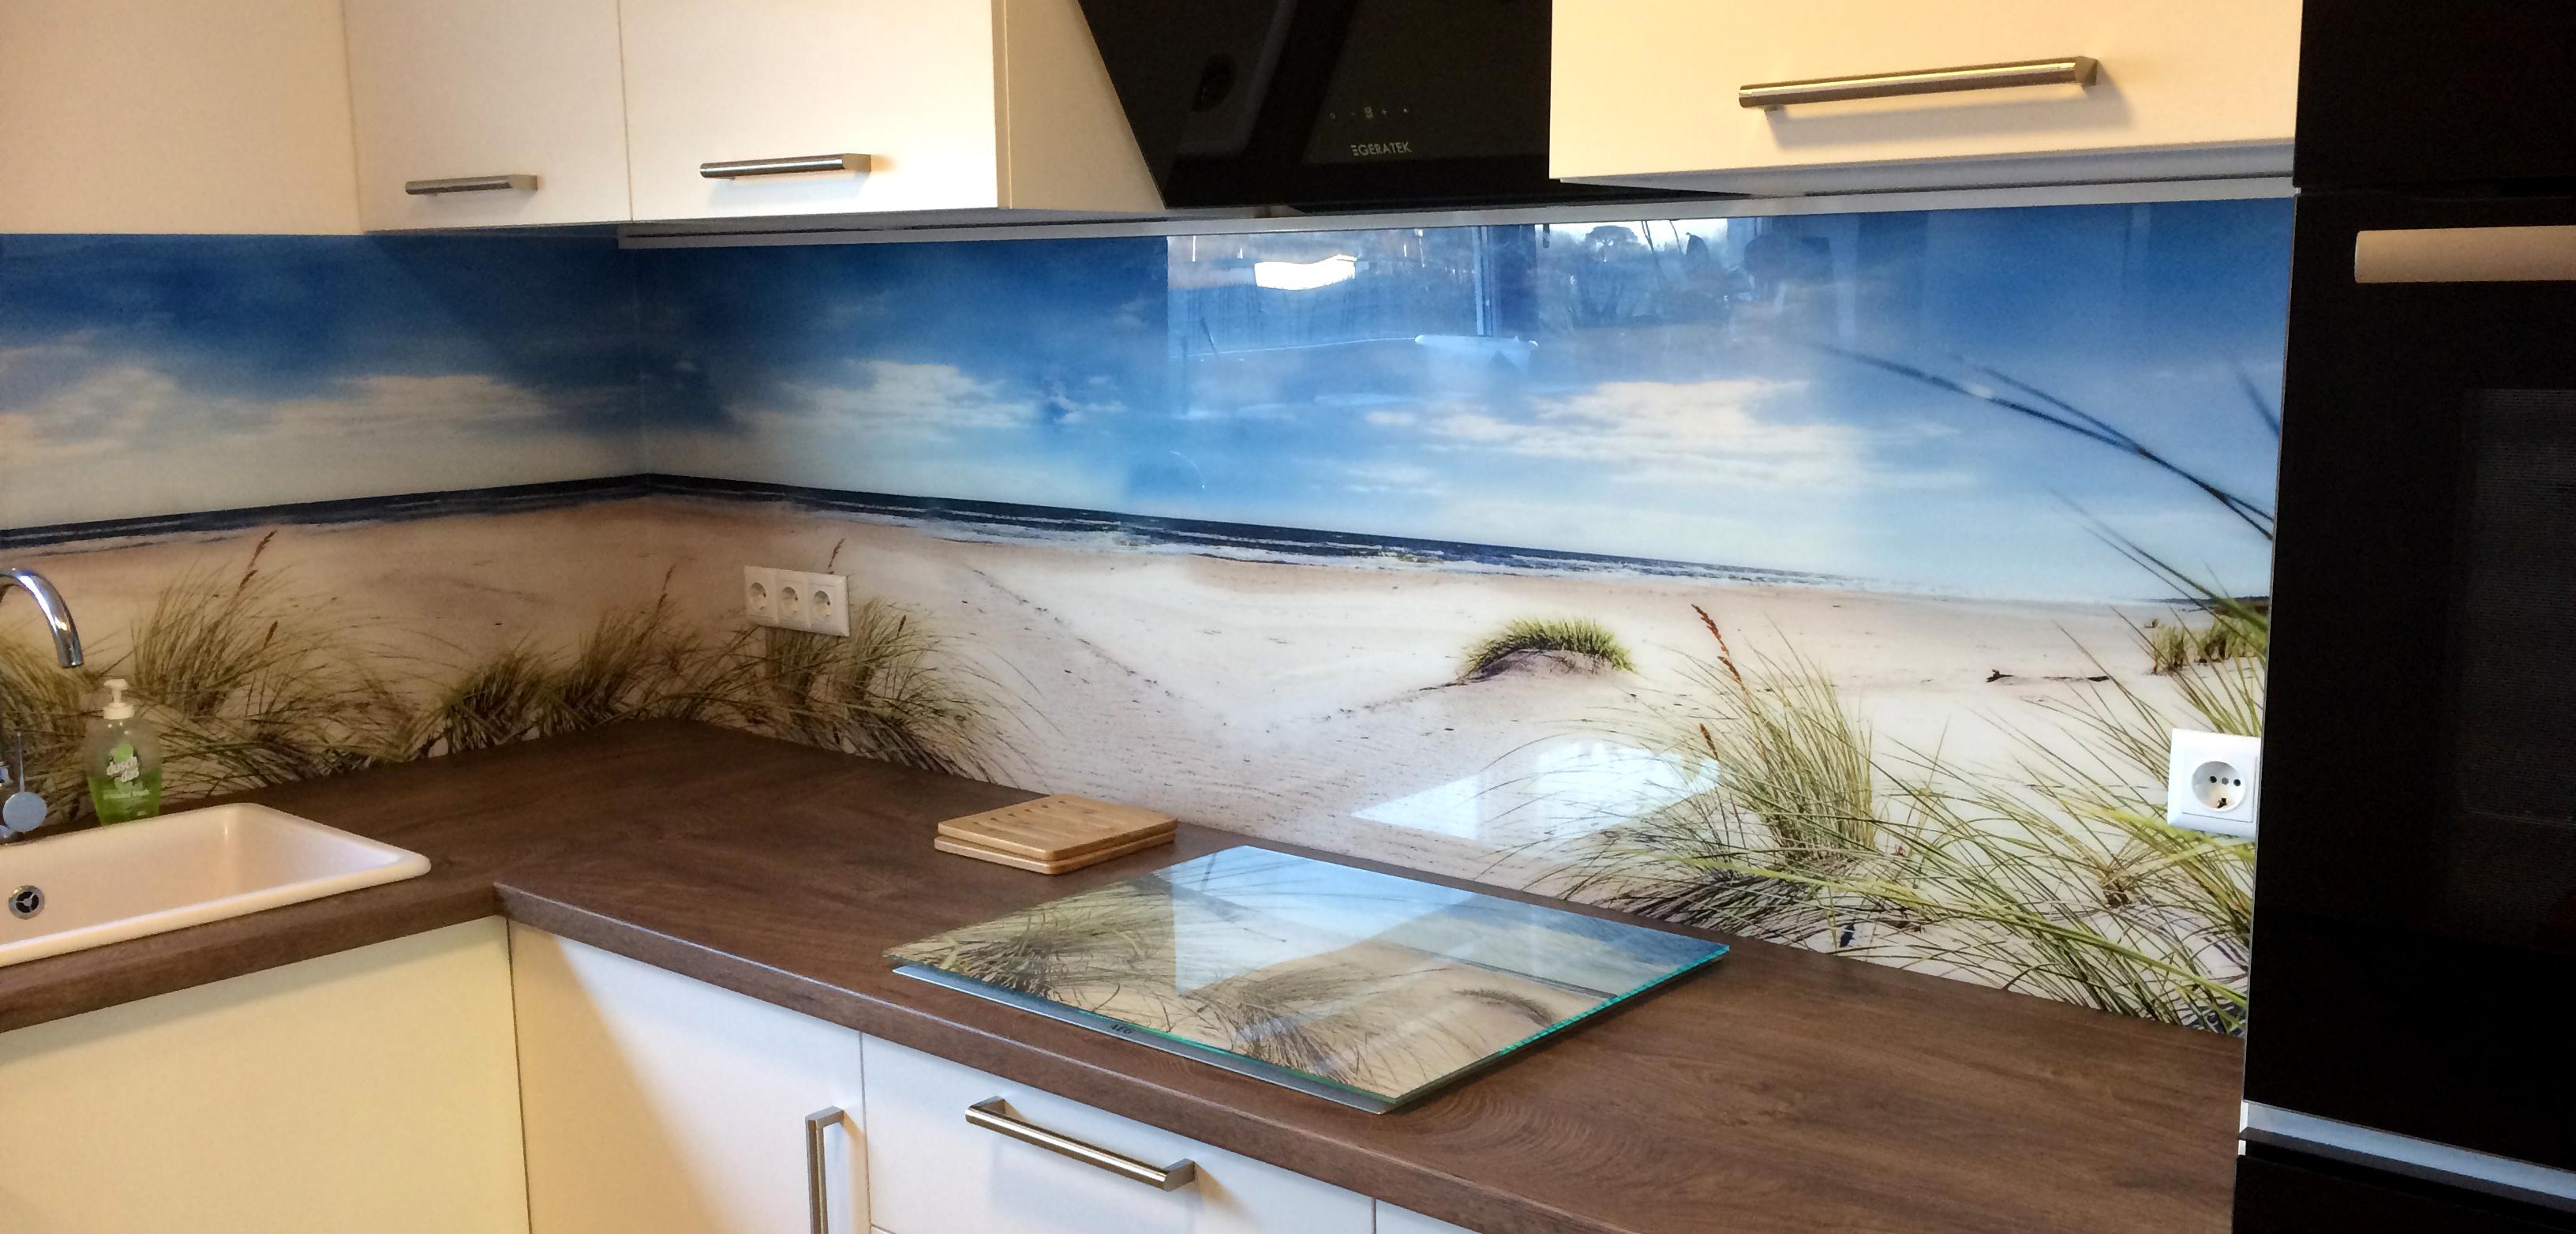 Küchenrückwand nach Maß - Küchenrückwand mit Motiv